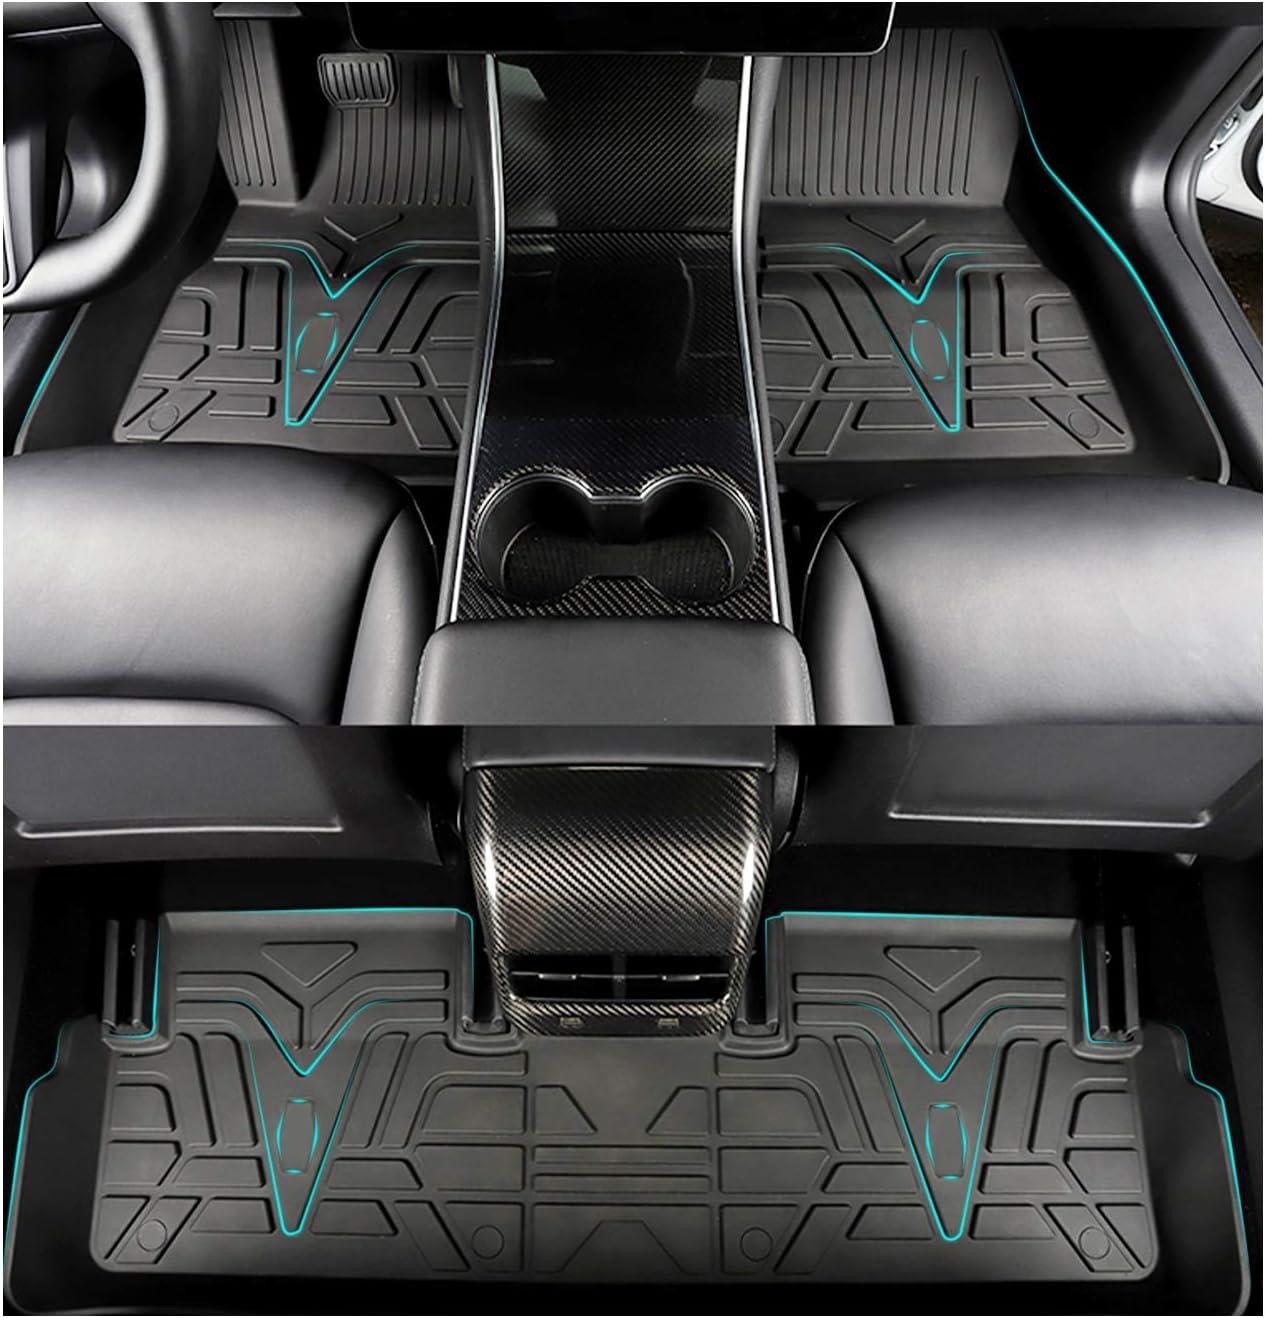 LFOTPP Tesla Model 3 Floor Mats Liners TPE Heavy Duty Custom Fit All-Weather 3D Full Cover Rubber Floor Mats Black for 2017-2021 Tesla Model 3 Custom Laser Cut Non-Slip